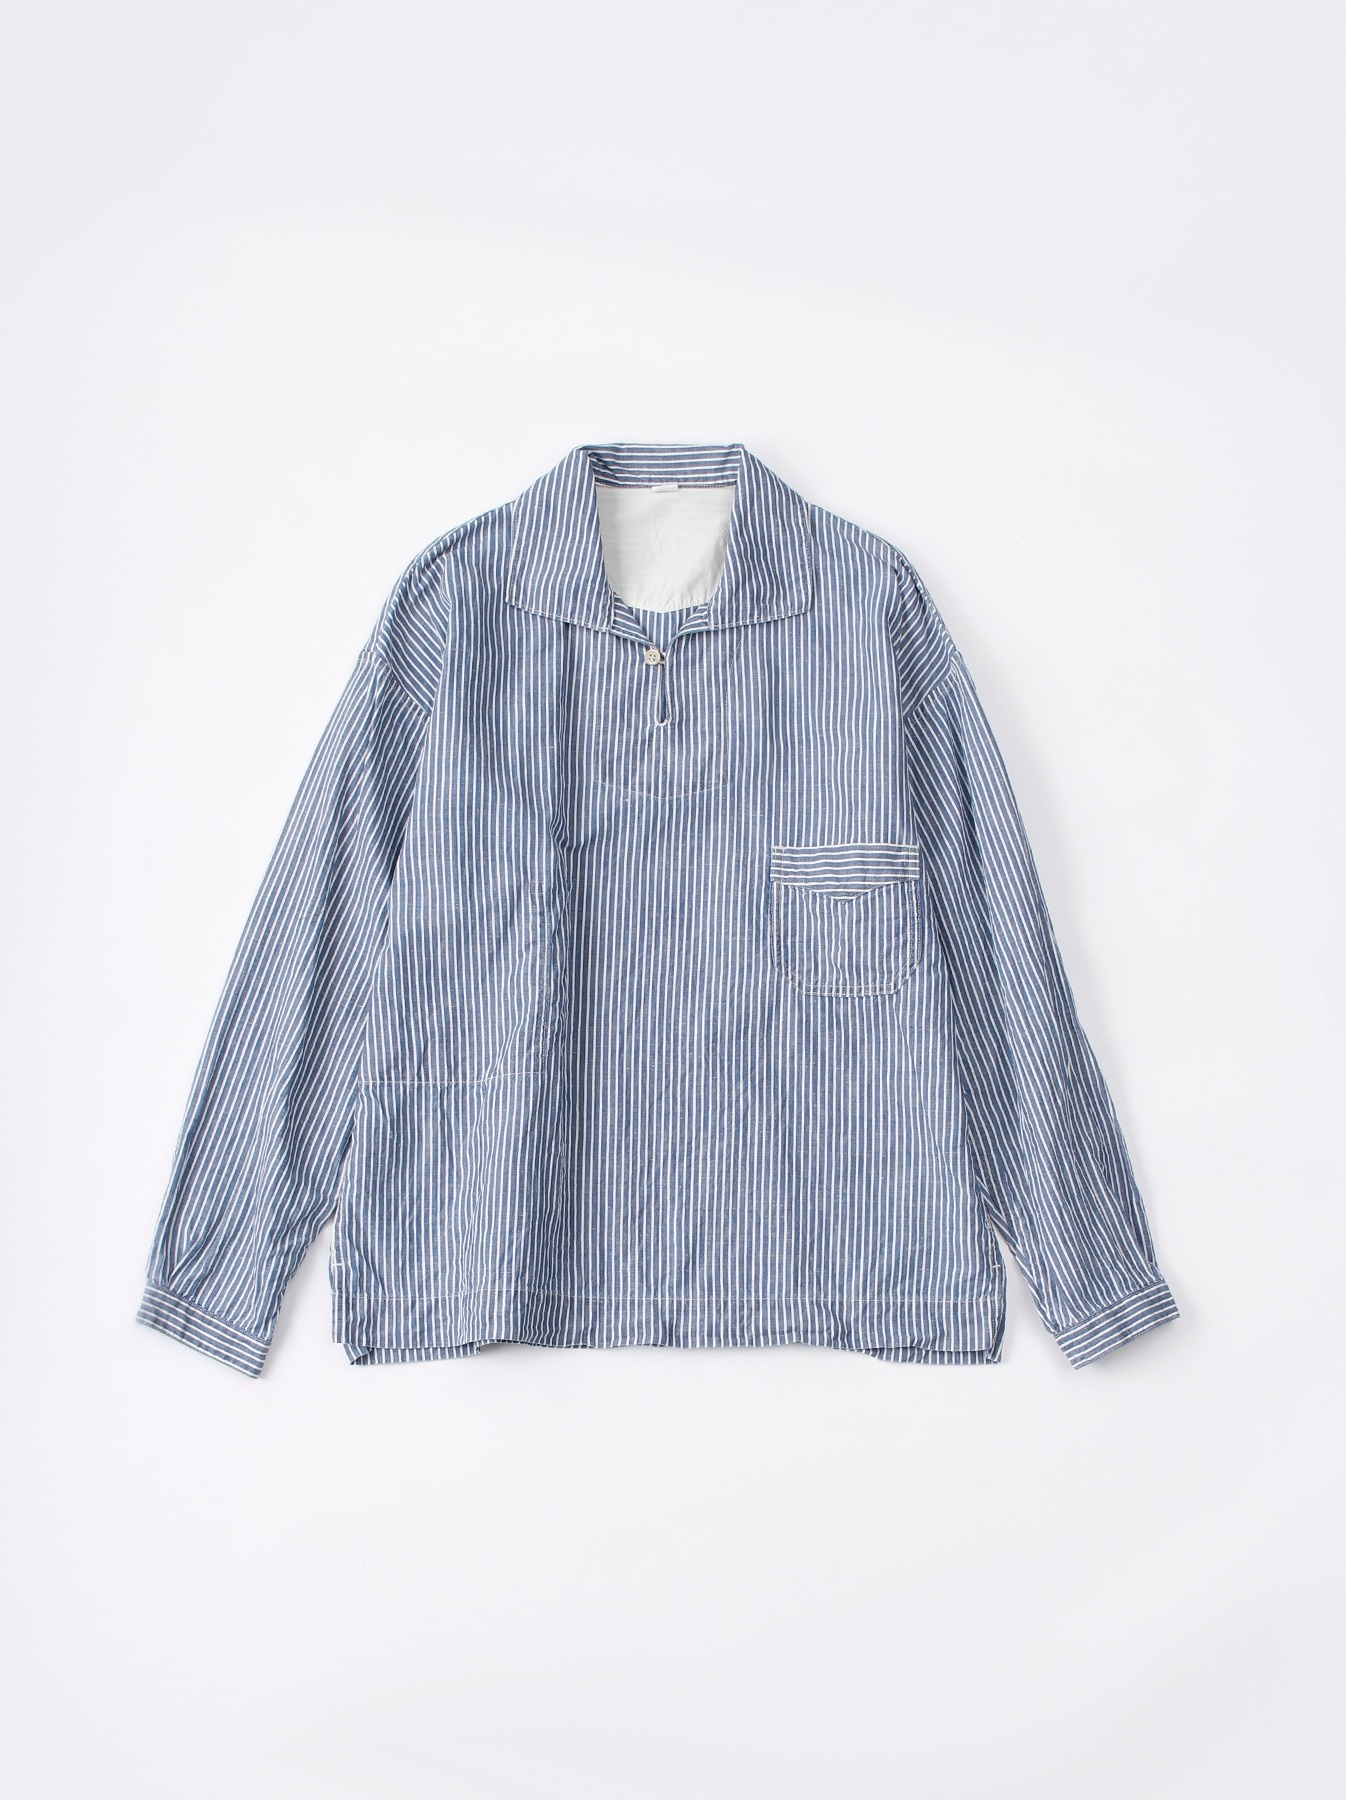 WH Cotton Linen Hickory Umahiko Pullover Shirt-1